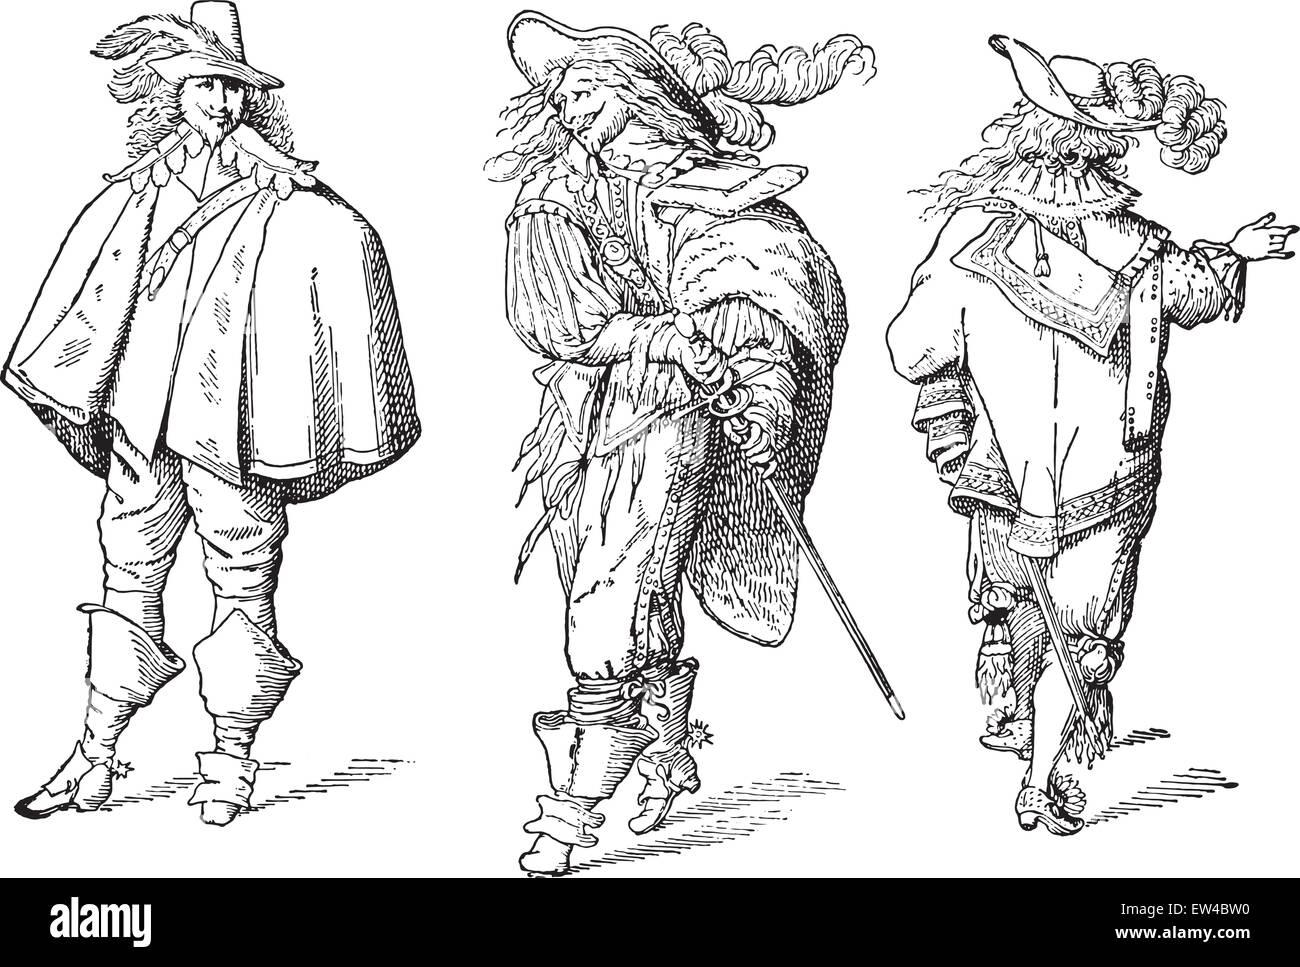 French gentlemen after Abraham Bosse (seventeenth century), vintage engraved illustration. Industrial encyclopedia - Stock Vector